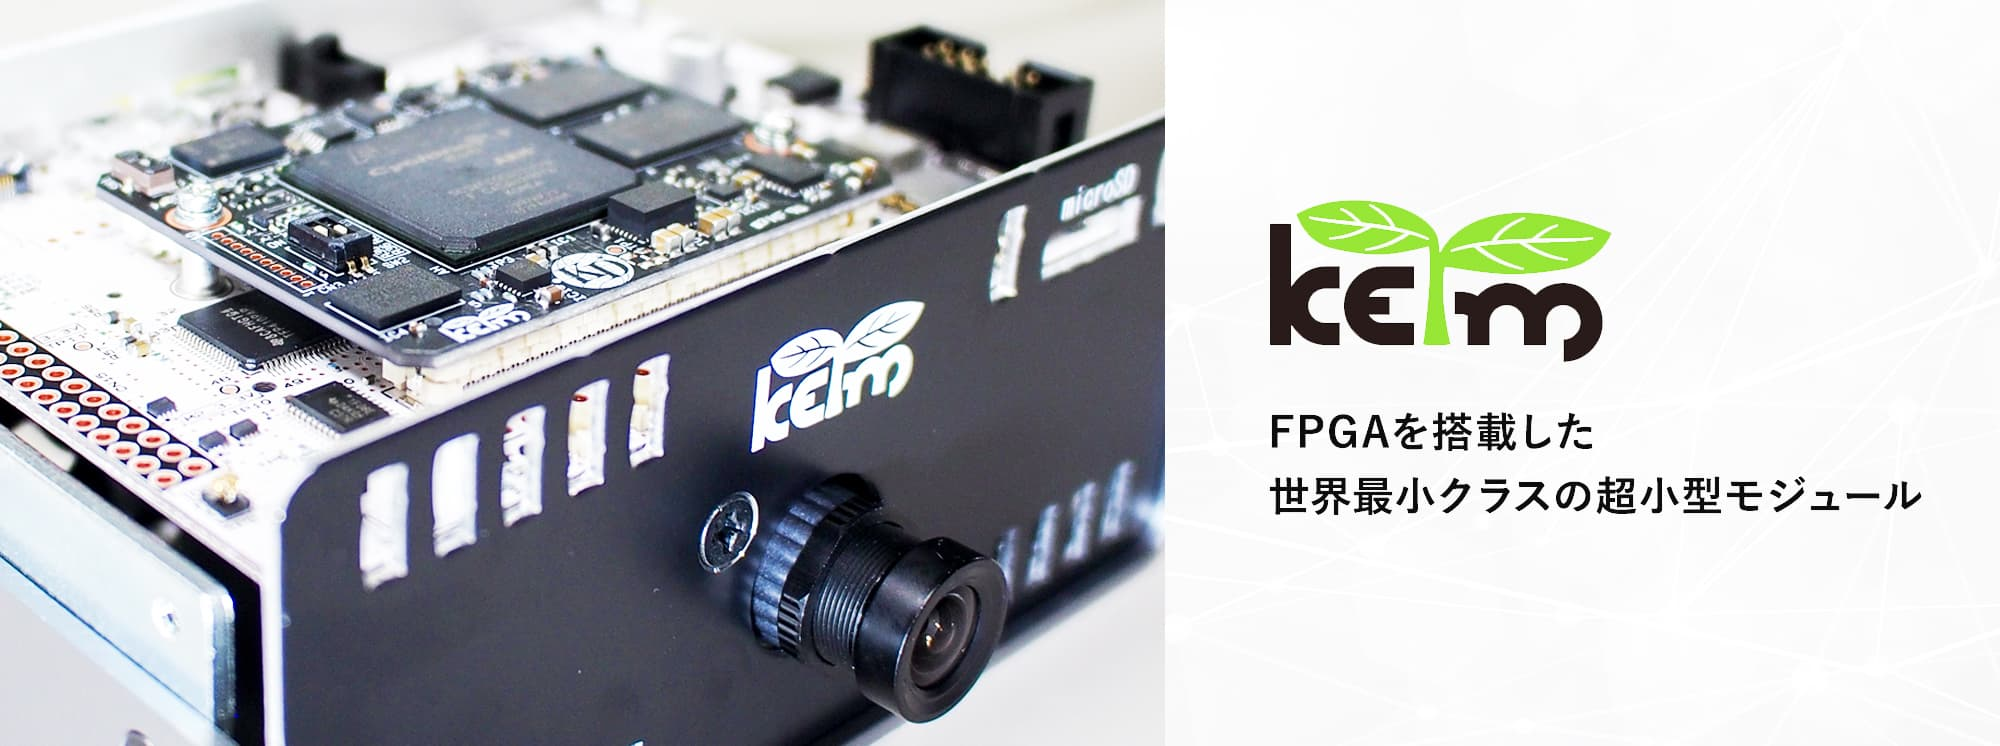 KEIm FPGAを搭載した世界最小クラスの超小型モジュール